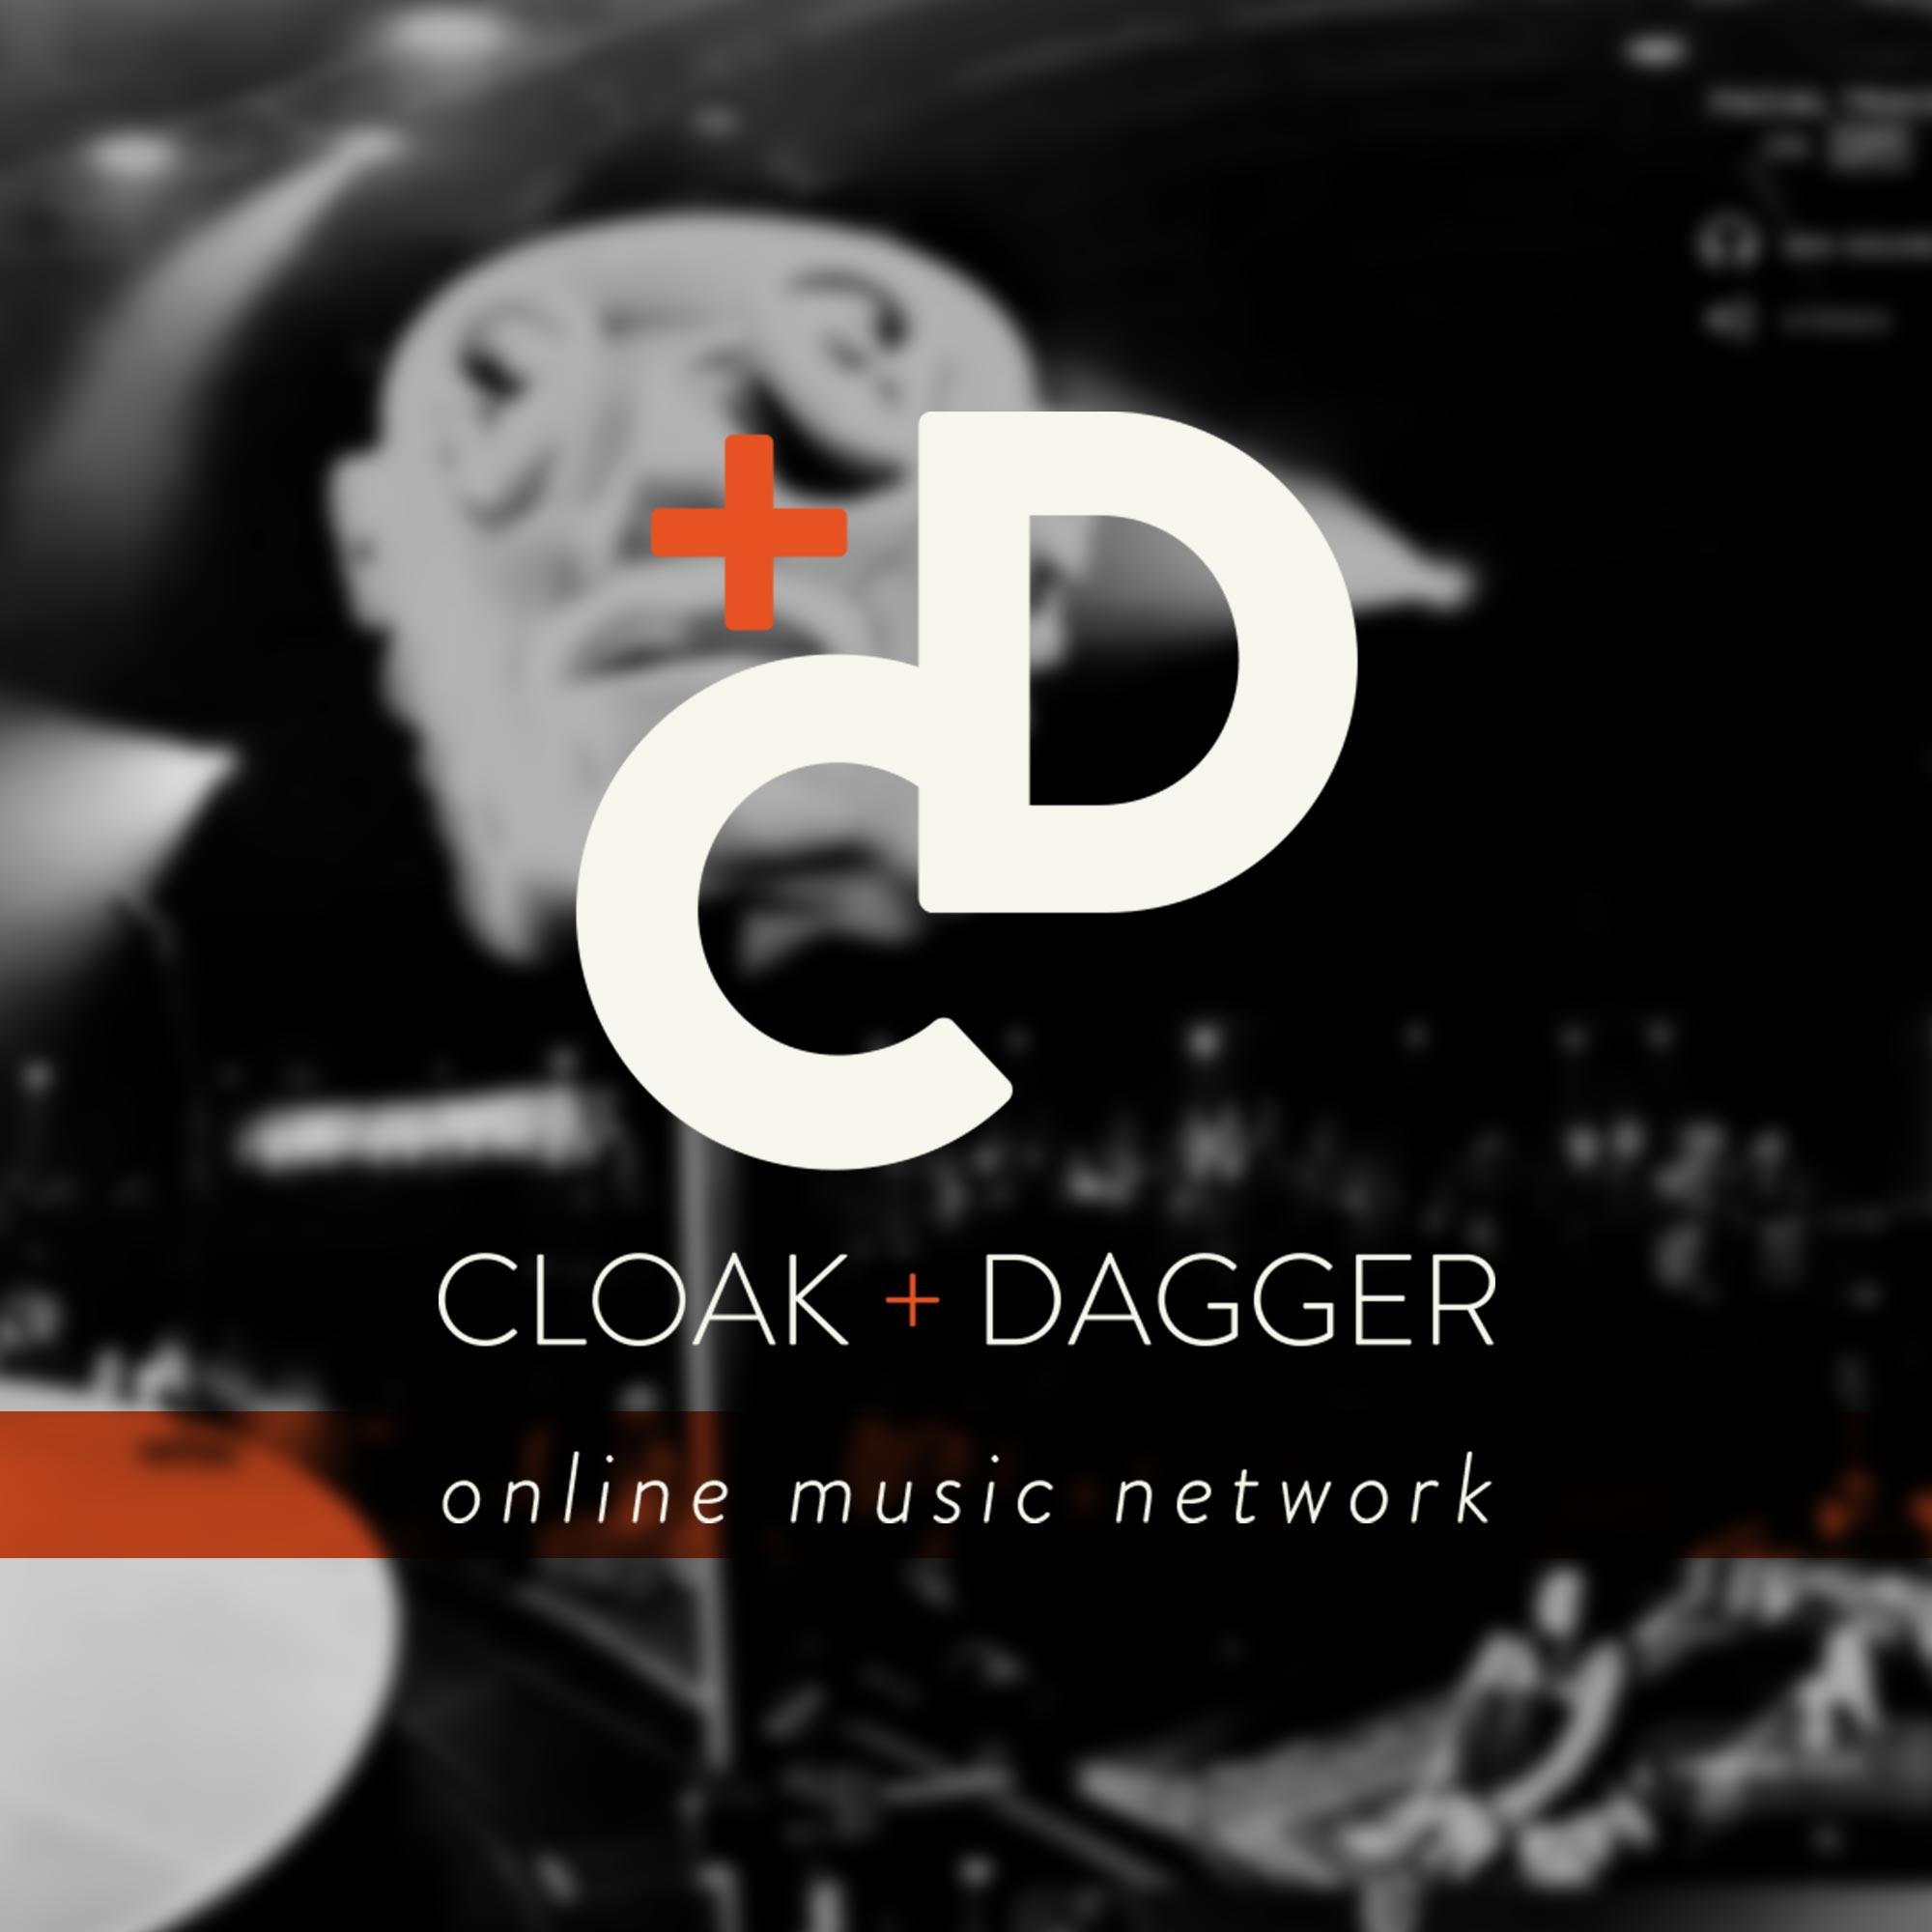 Cloak + Dagger Network